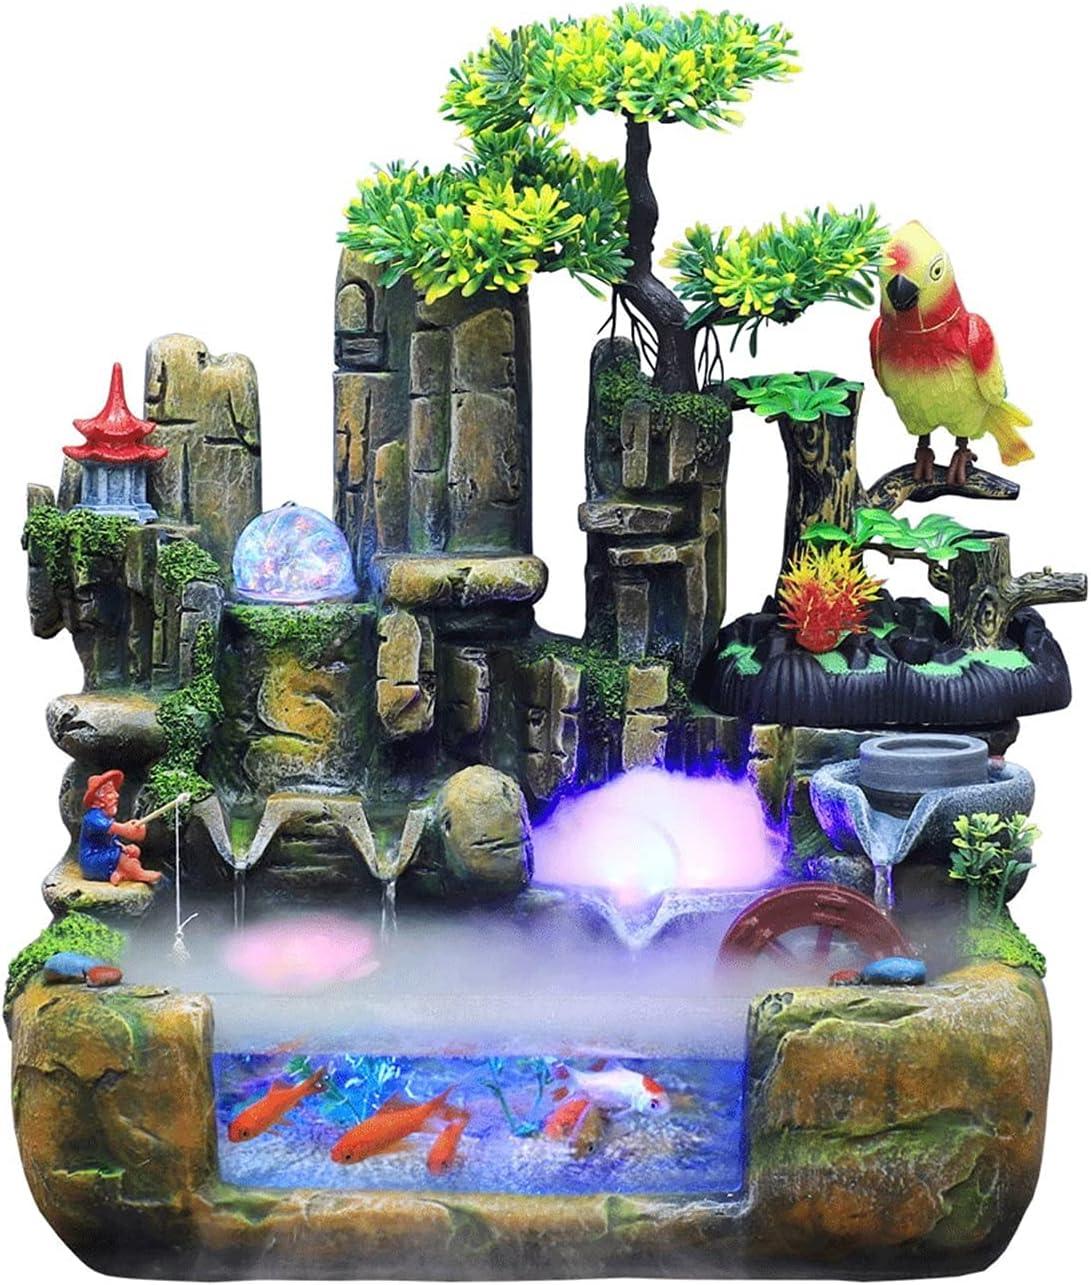 DJDLLZY Tabletop Fountains Award Rockery Popular popular Fountain Wate Indoor